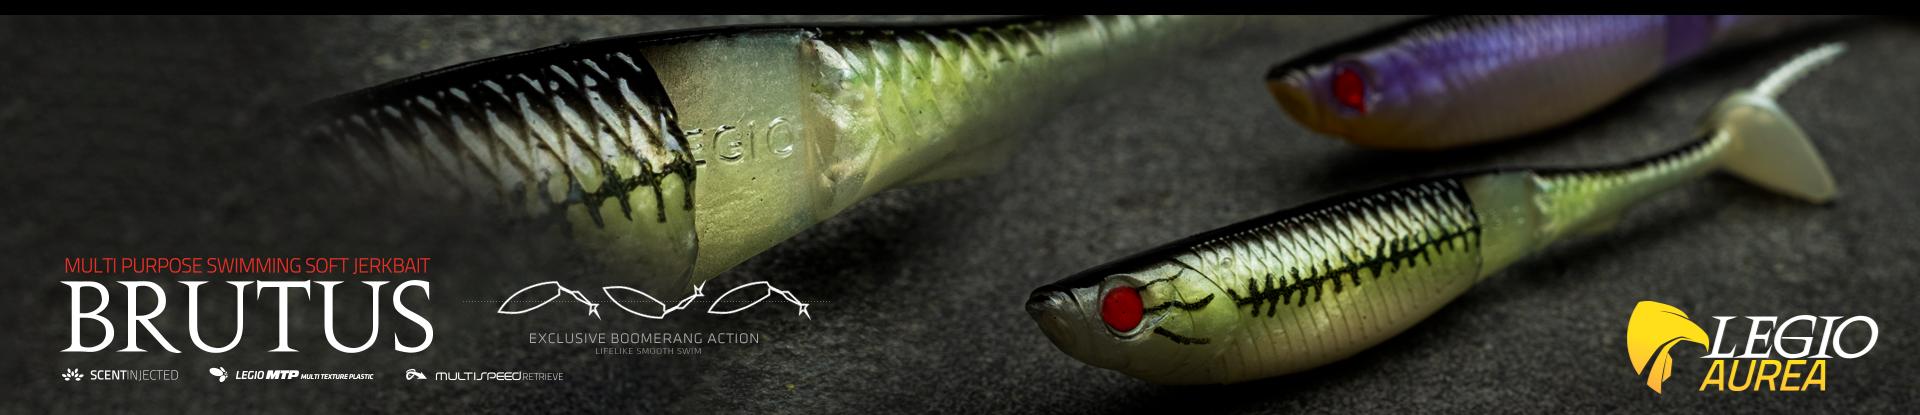 bass fishing, legio aurea, spinning, bass